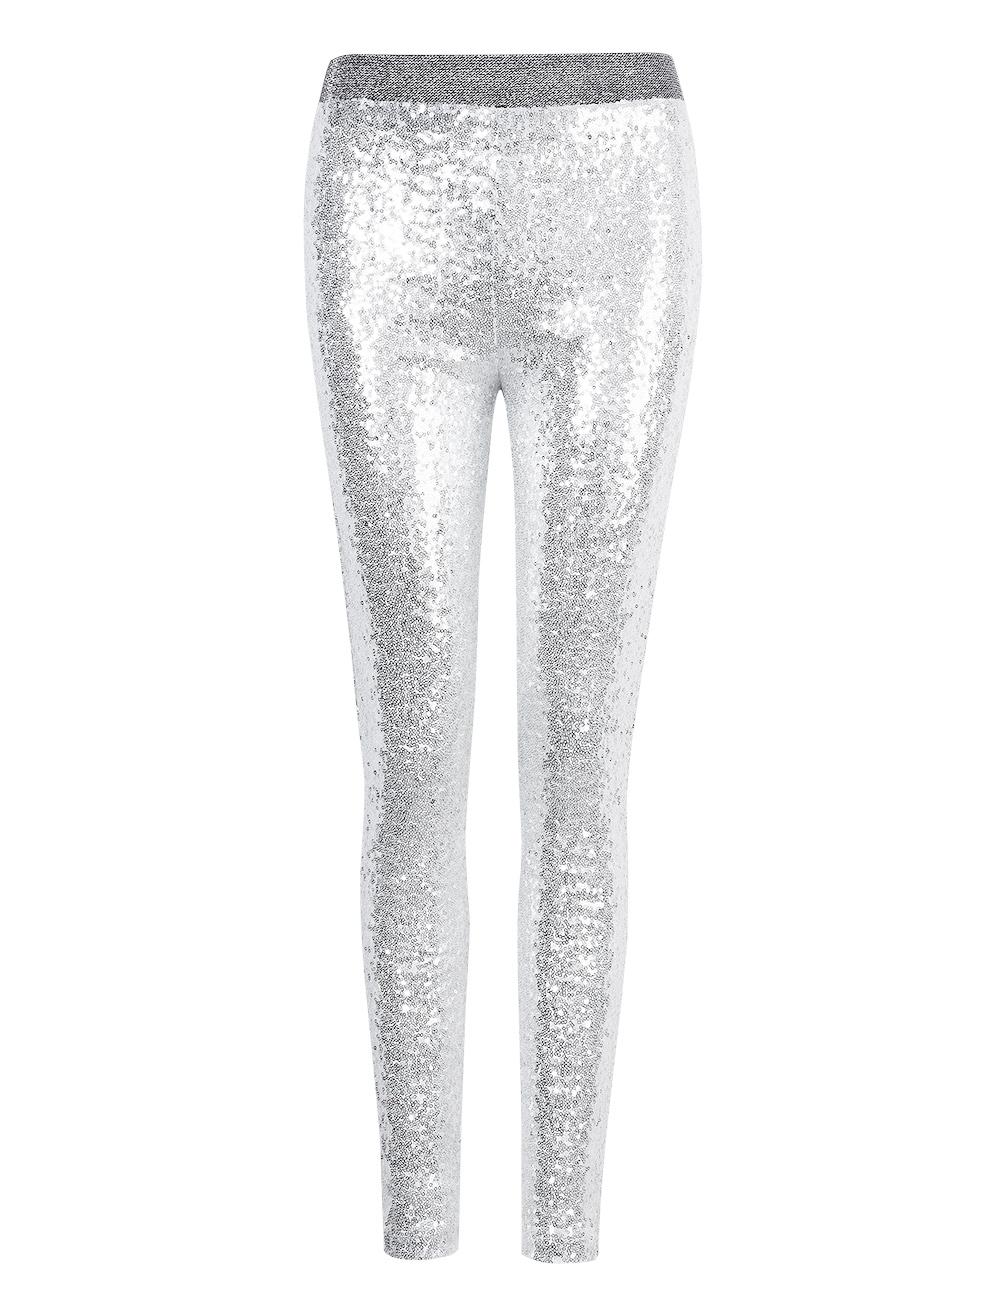 Silver Rockabilly Womens Sequins Leggings Pants METALLIC ...